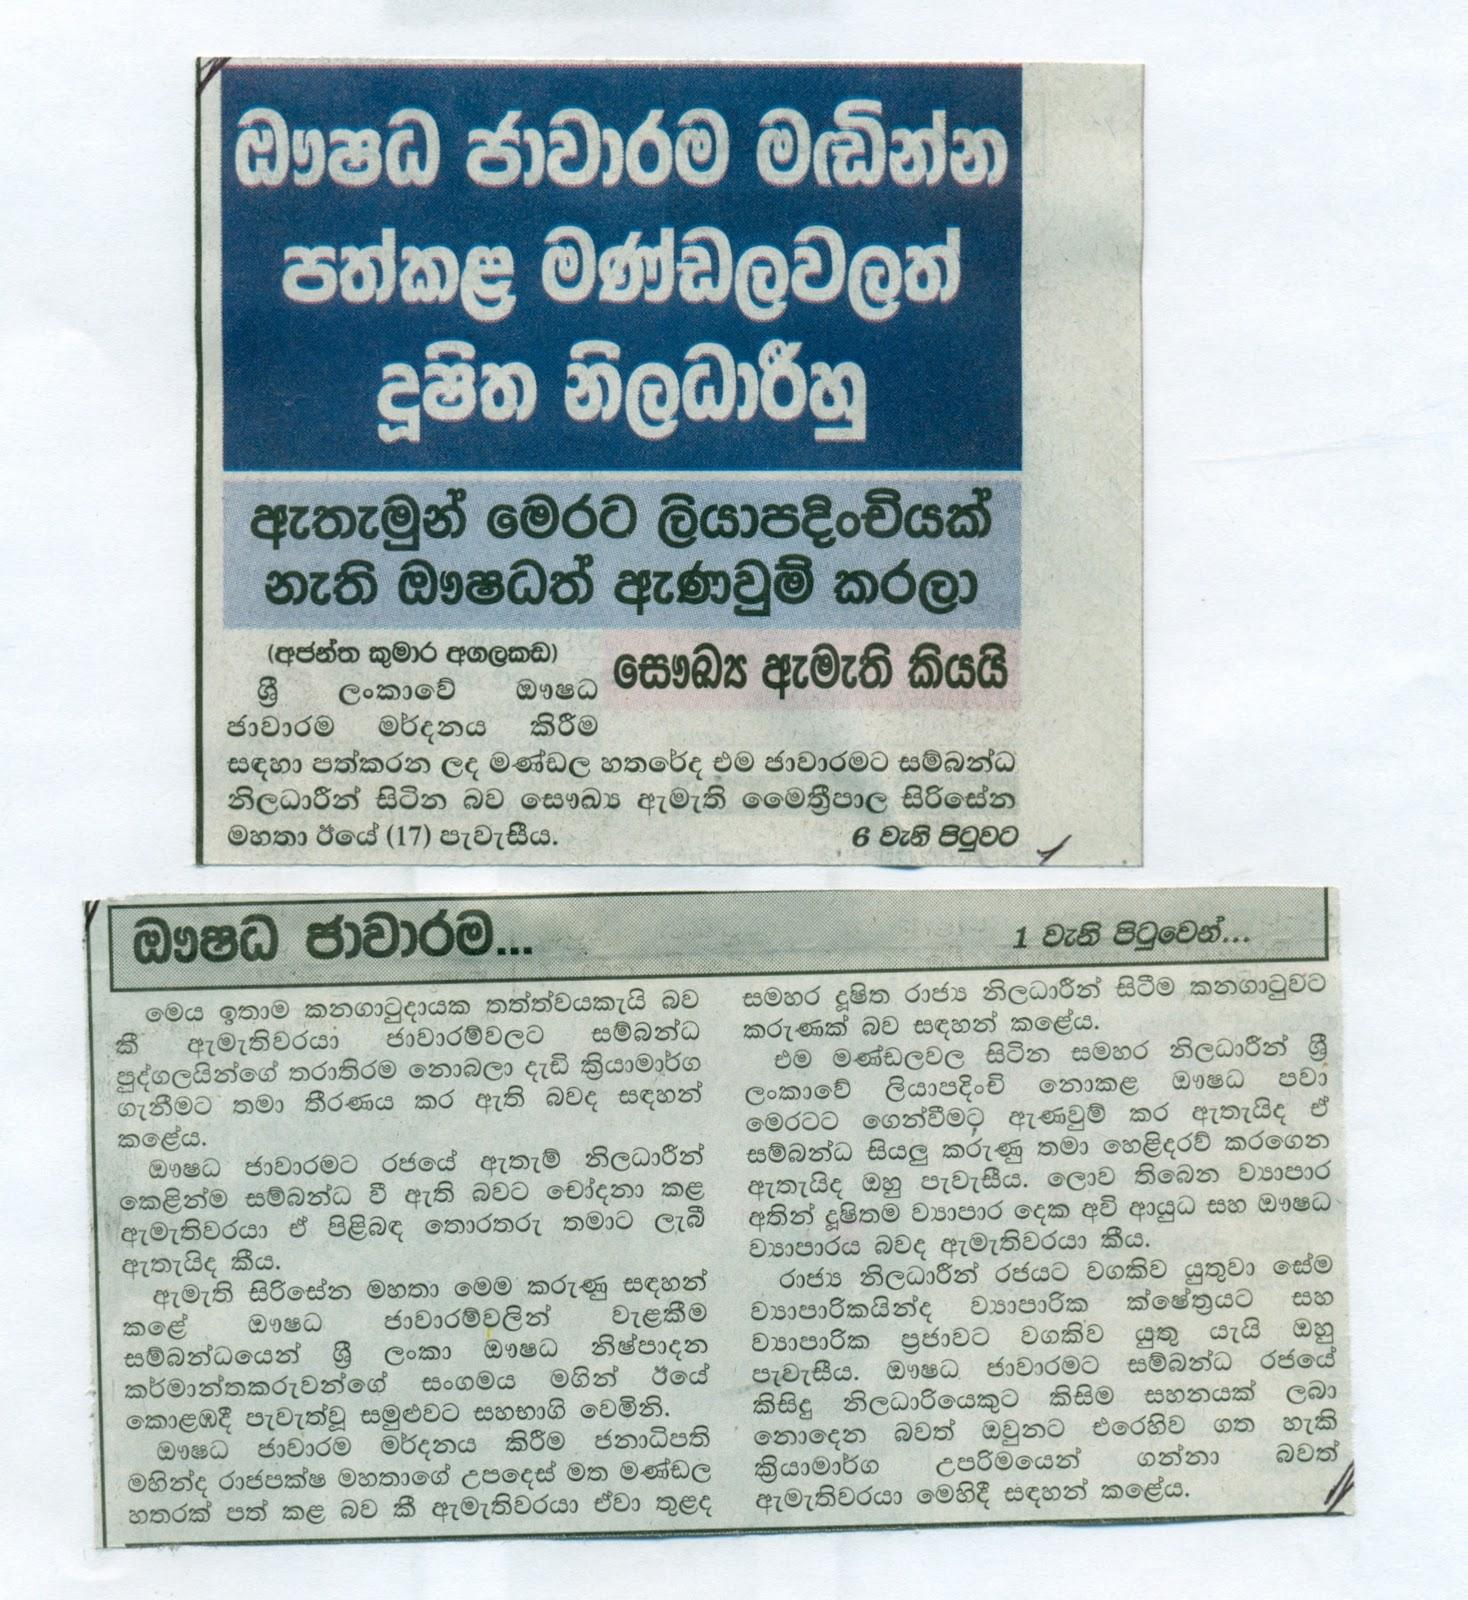 Lankadeepa lahipita 2  Sri Lanka Marriage Proposals  2019-07-22